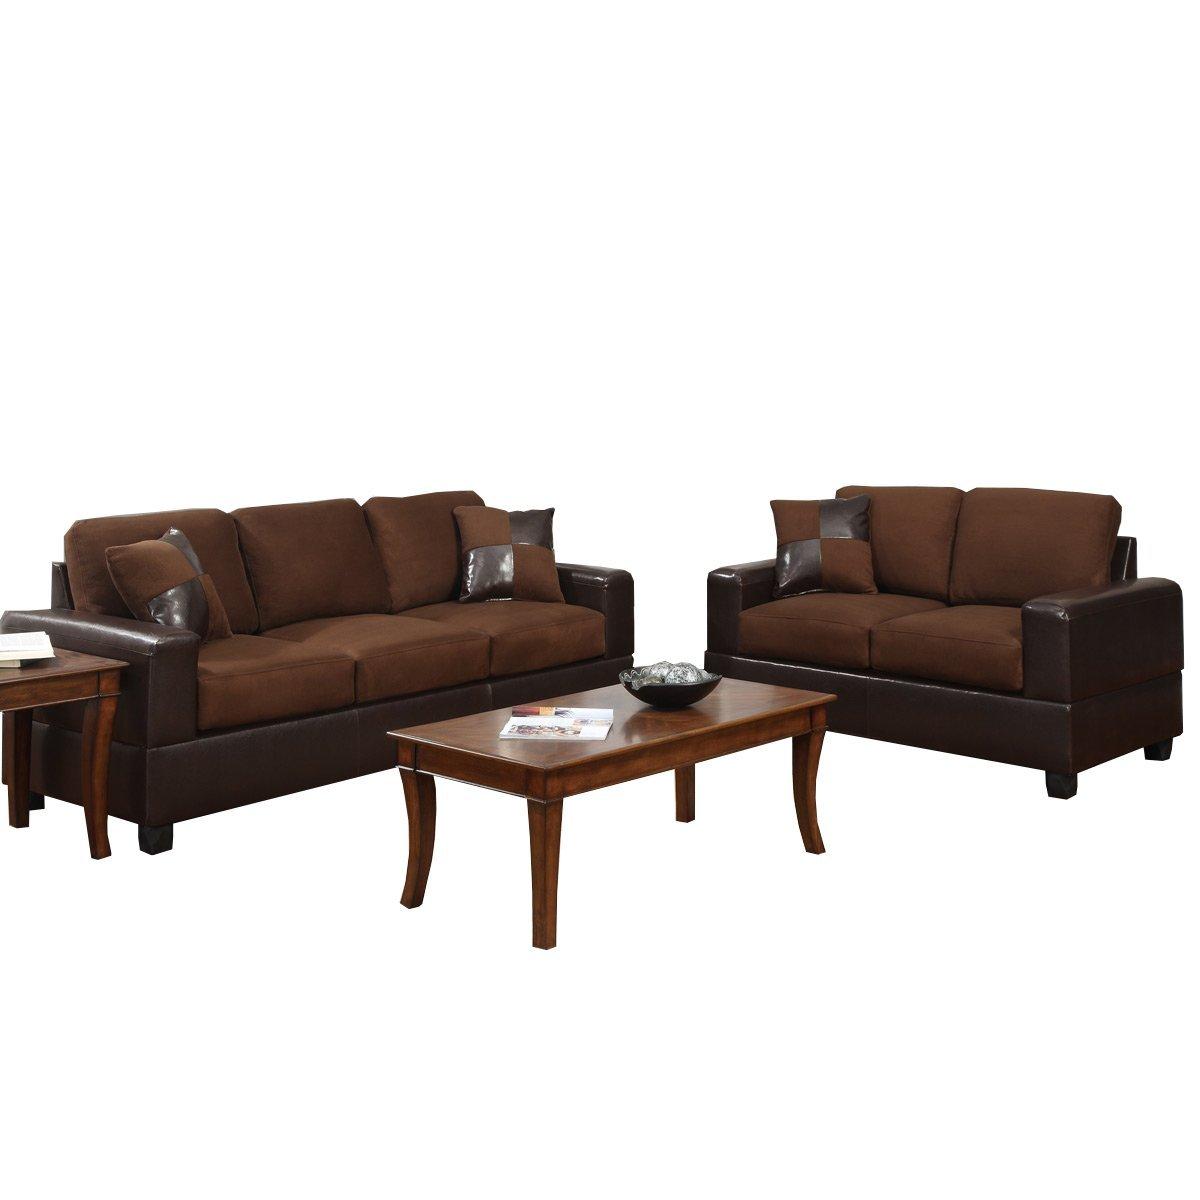 Bobkona Seattle Microfiber Sofa and Loveseat 2-Piece Set in Chocolate Color